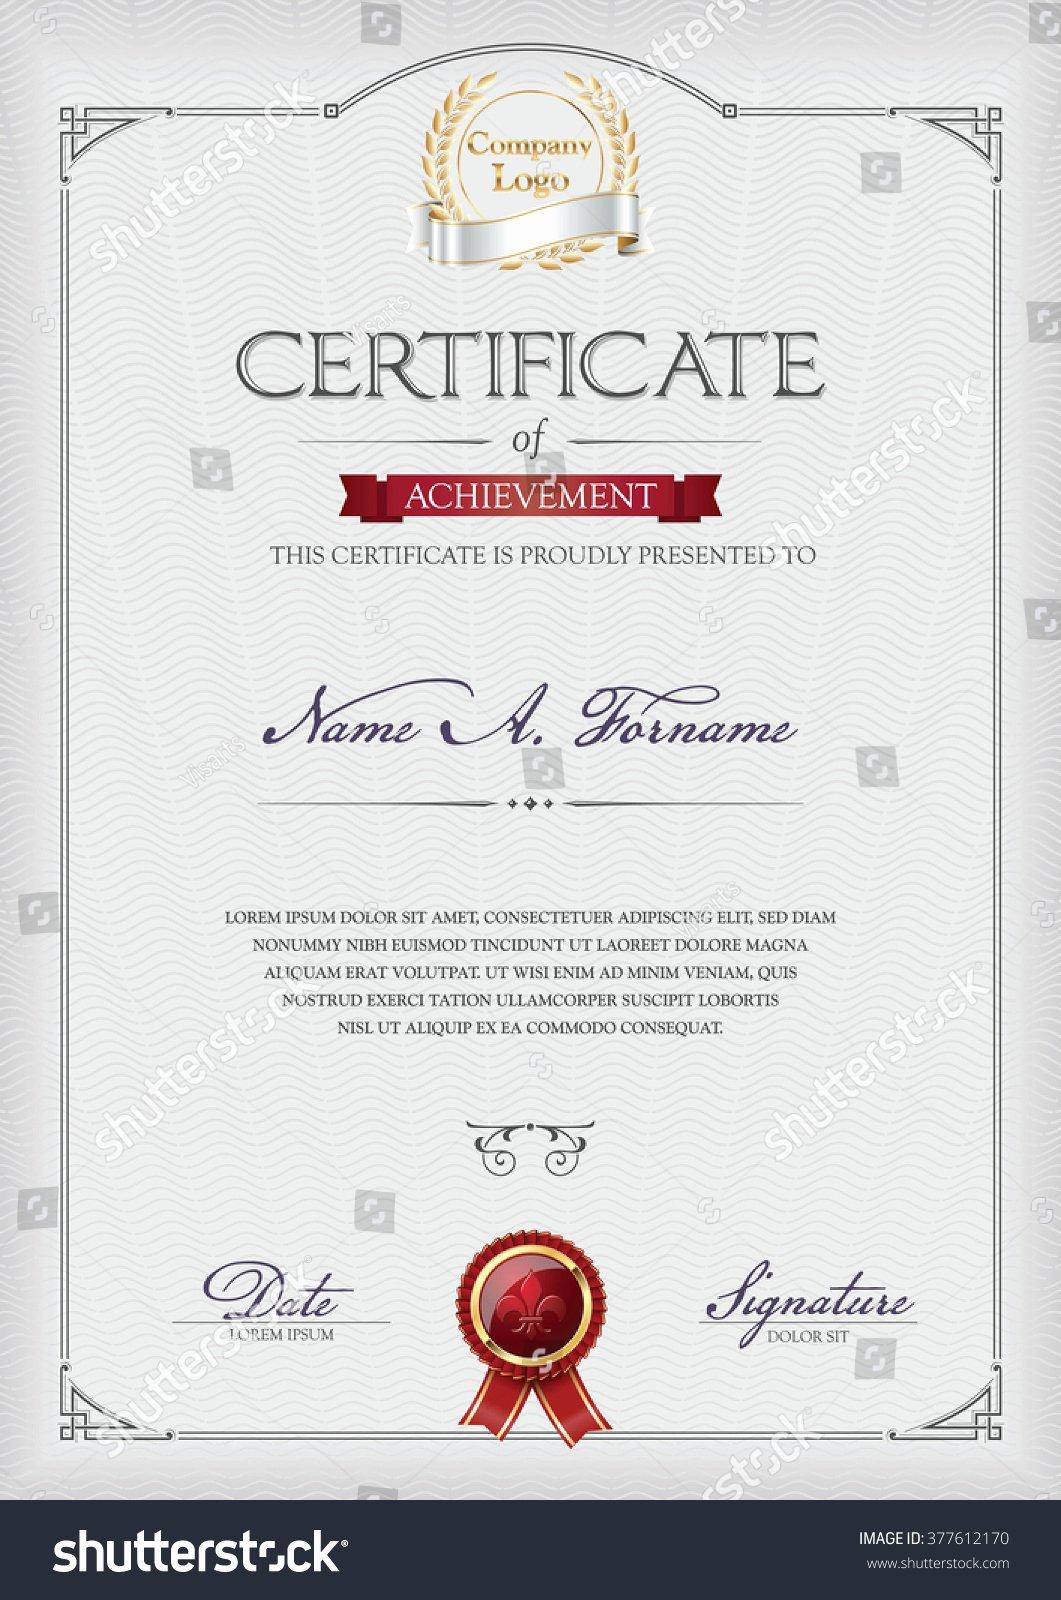 Certificate Of Achievement Frame Beautiful Certificate Achievement Portrait Vintage Frame Stock